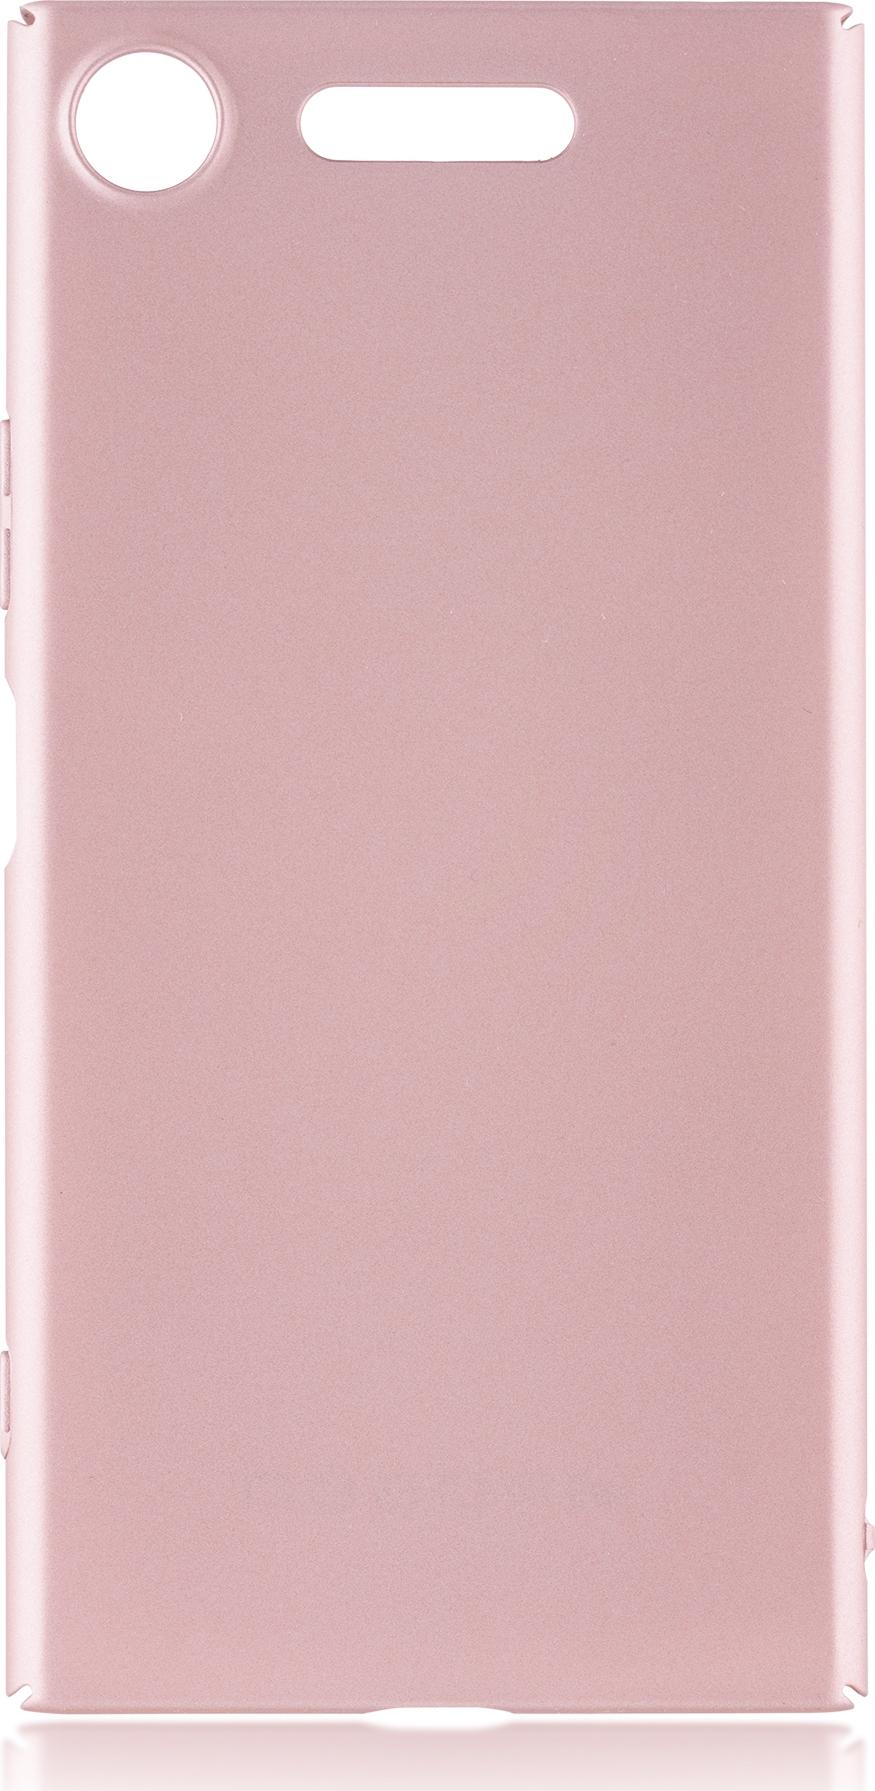 Чехол Brosco 4Side Soft-Touch для Sony Xperia XZ1, розовый